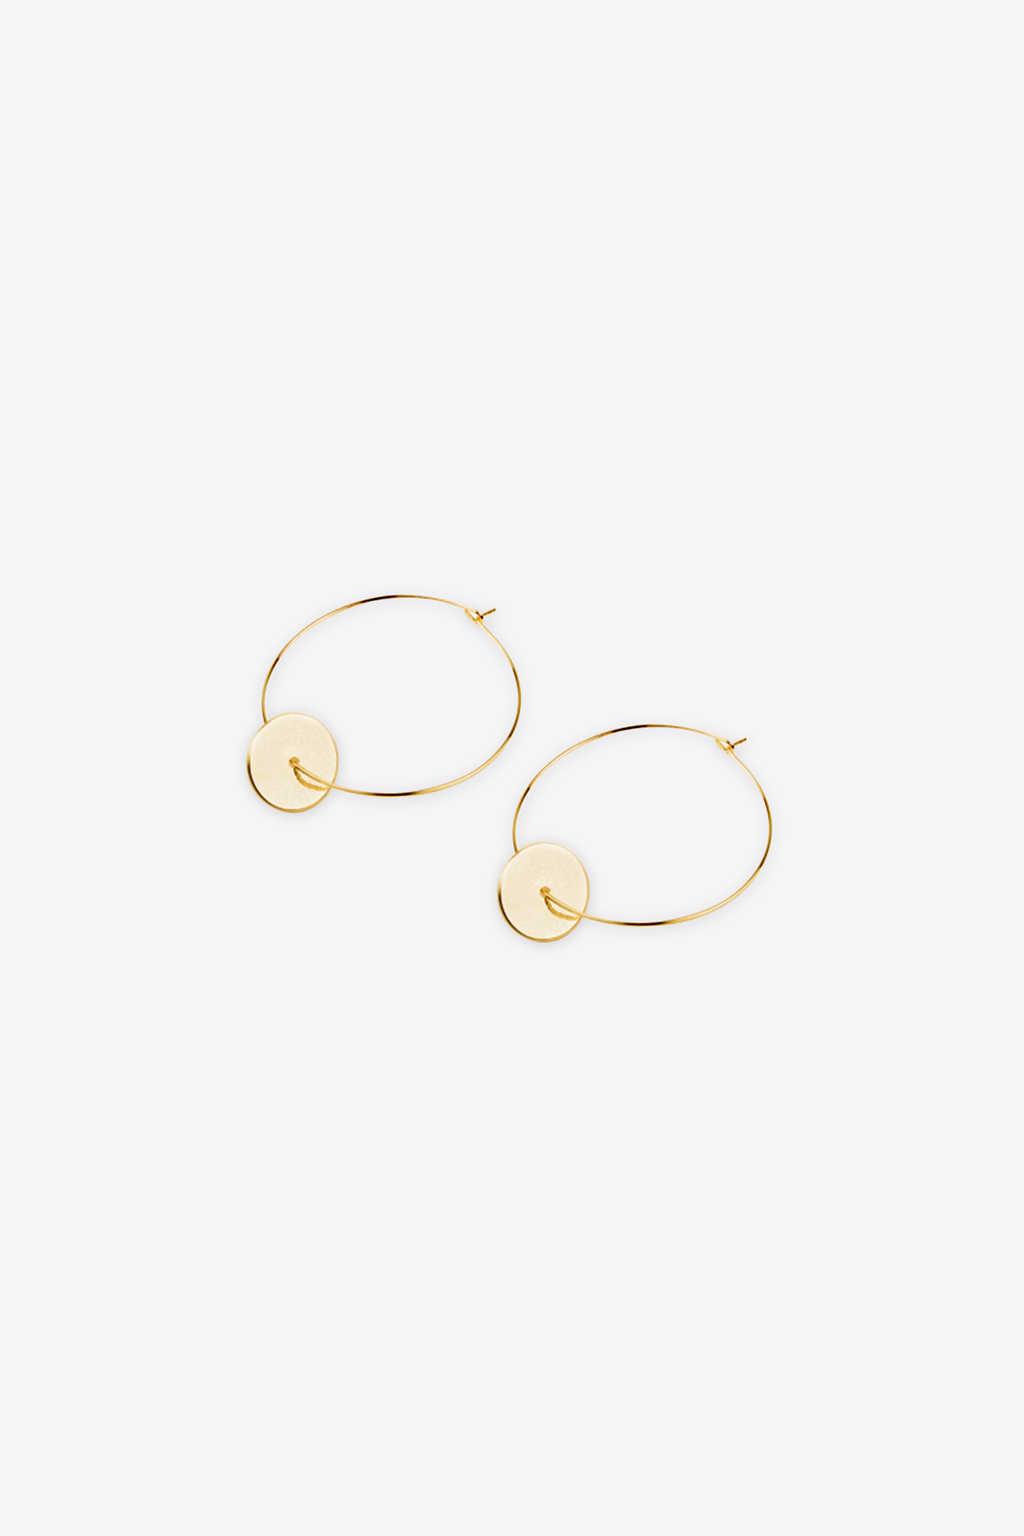 Earring H331 Gold 1